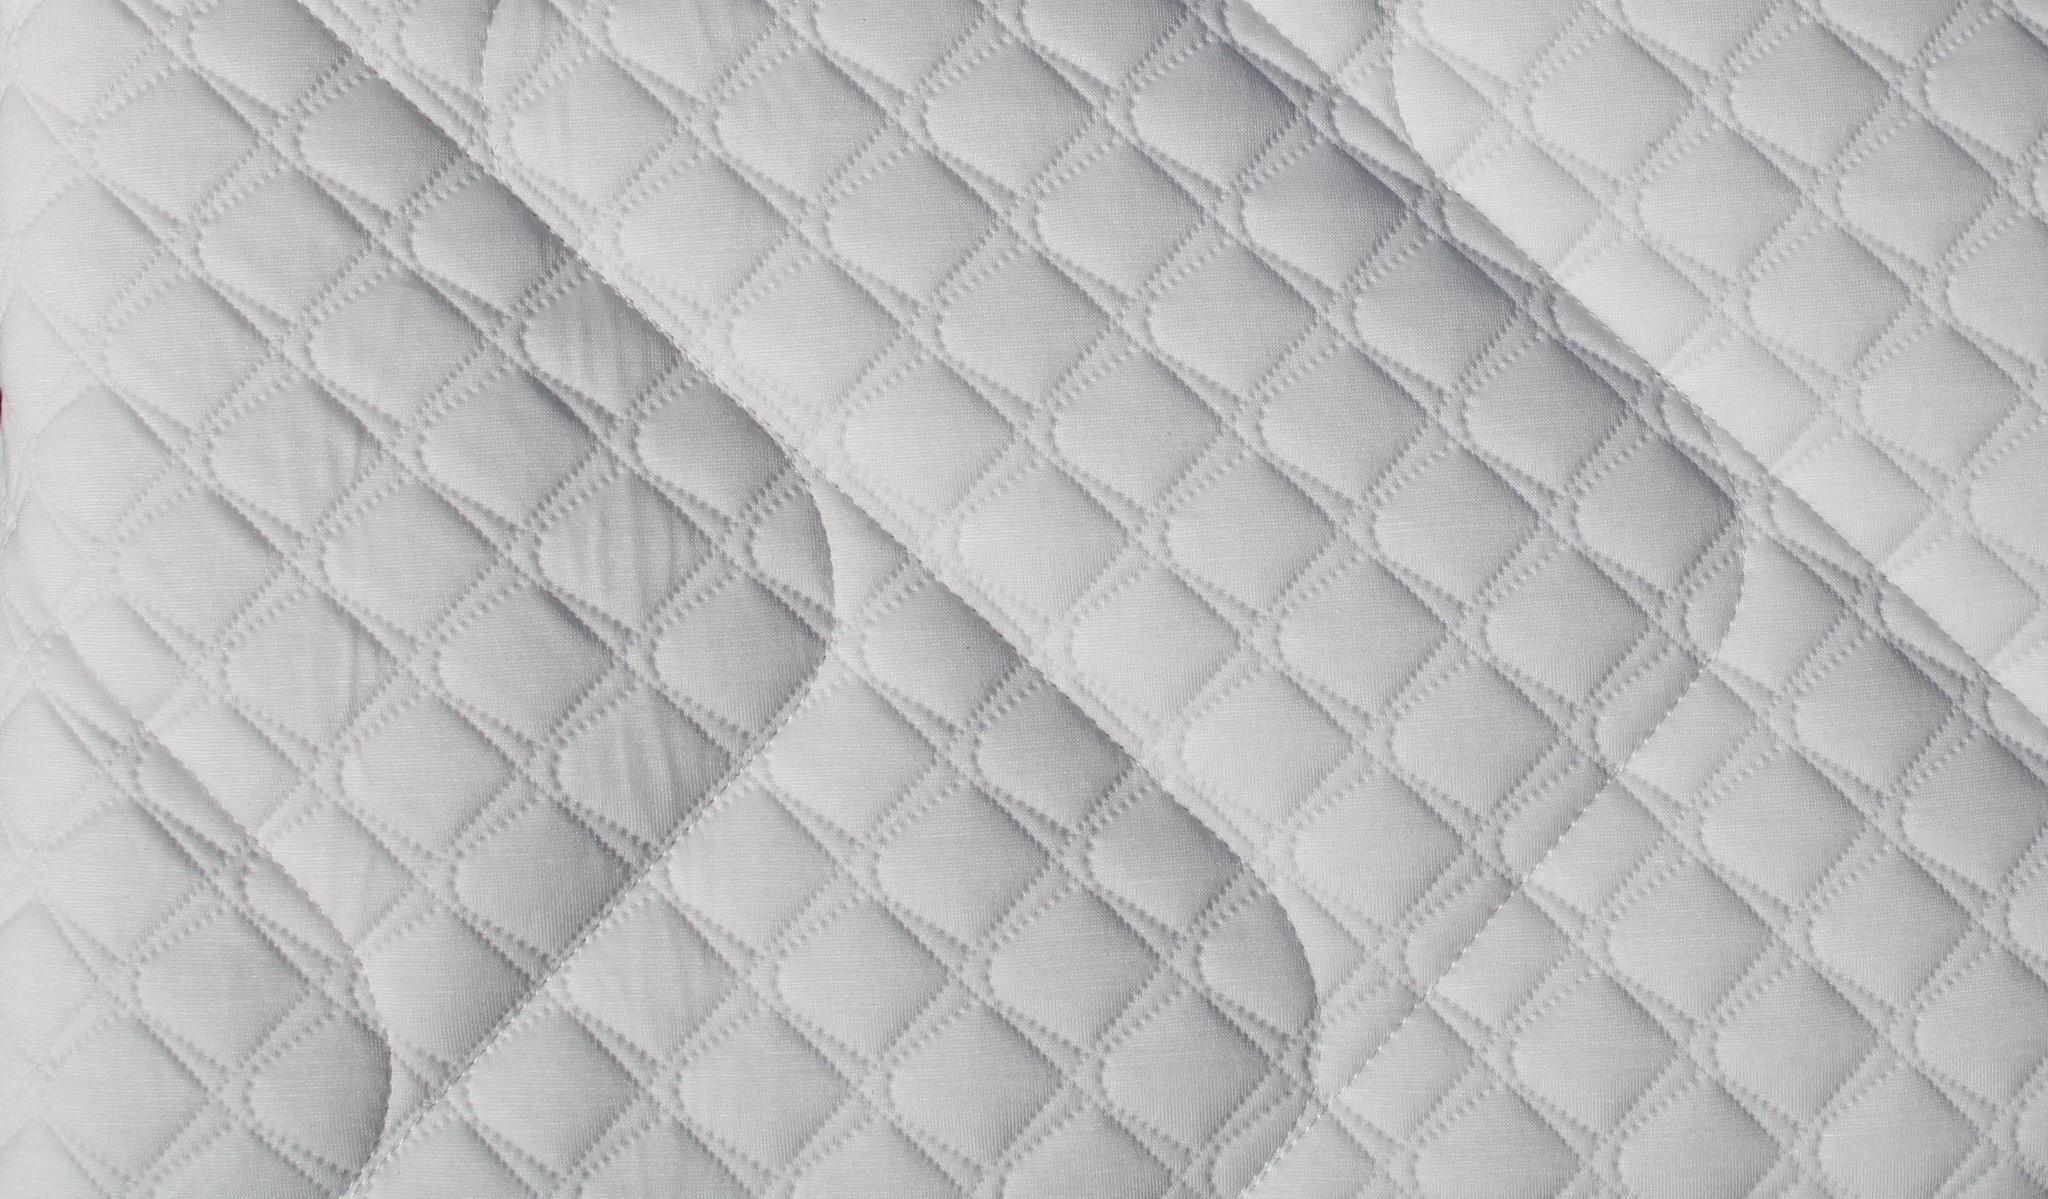 Sarpy Kindermatras 80x120 Sertel Tailor Made Mattress